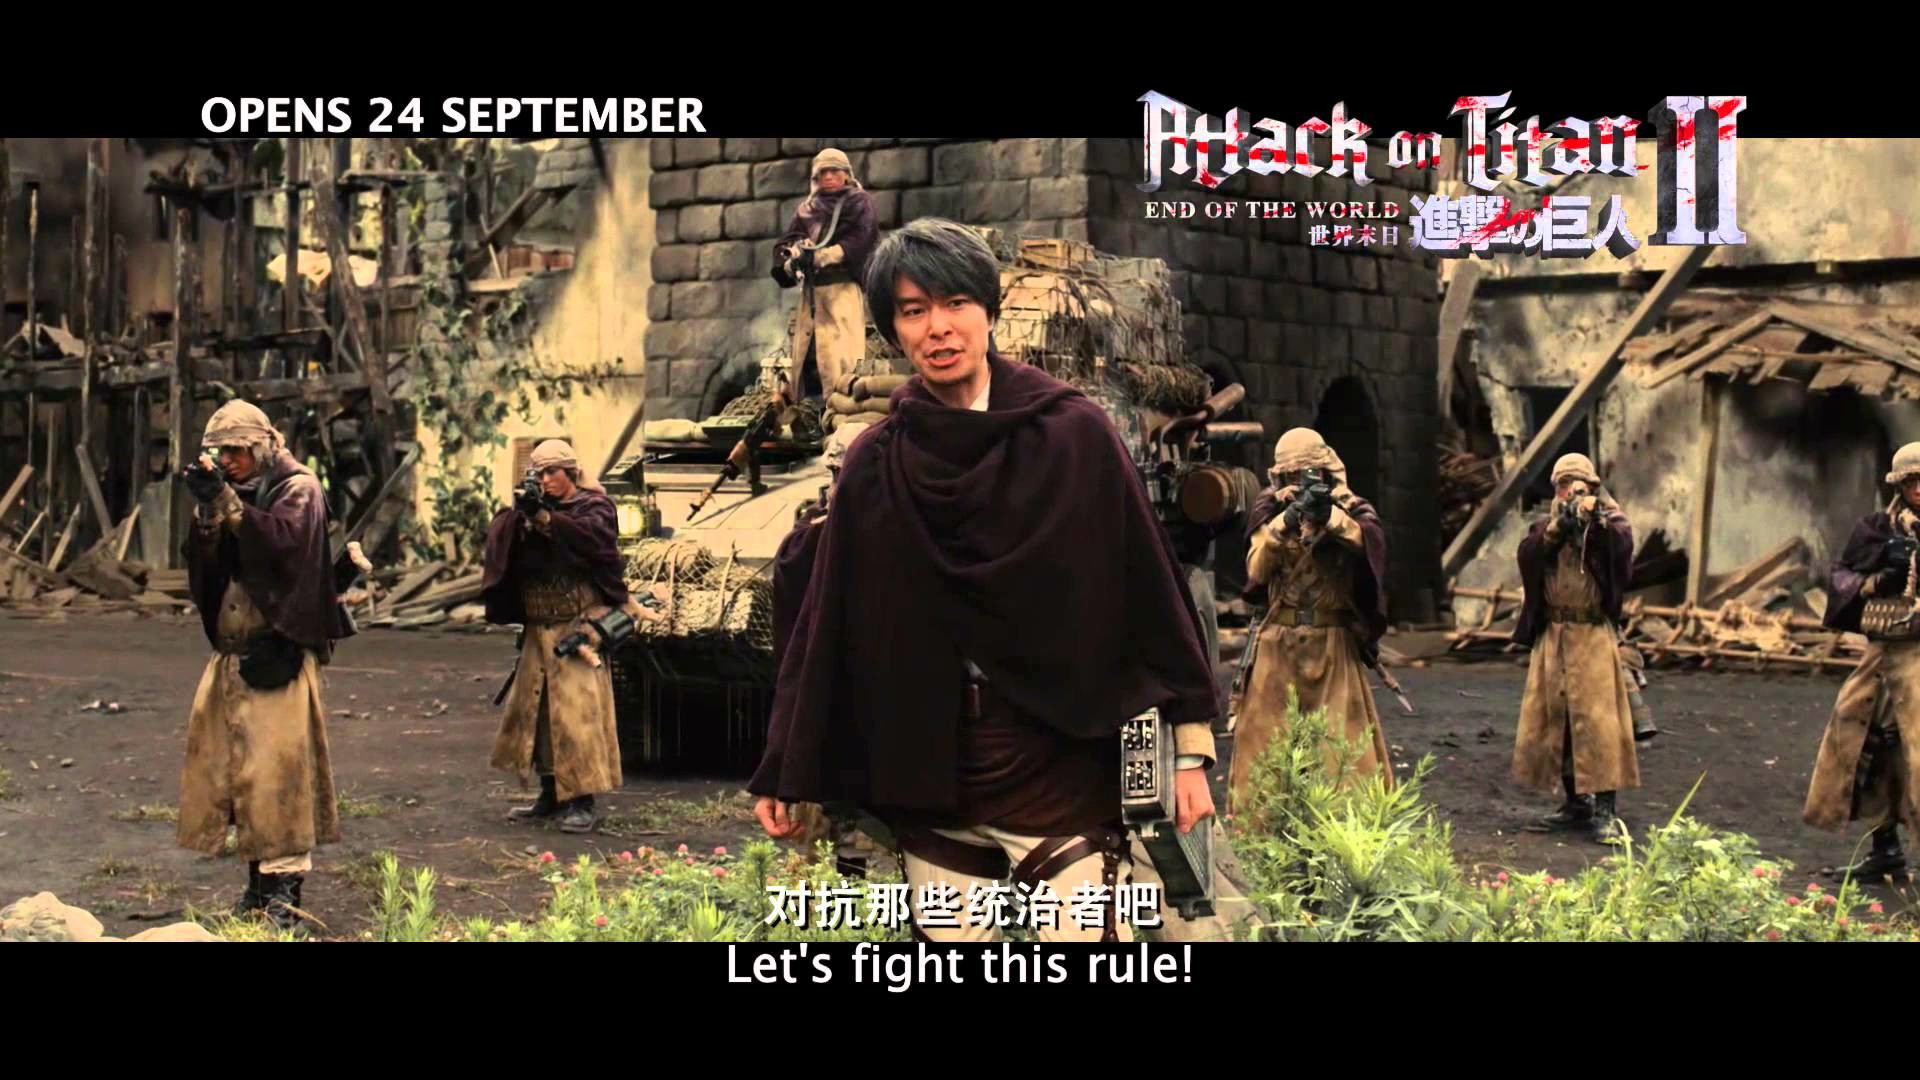 ATTACK ON TITAN 2: END OF THE WORLD 进击的巨人2:世界末日 – In SG Cinemas 24  September – YouTube